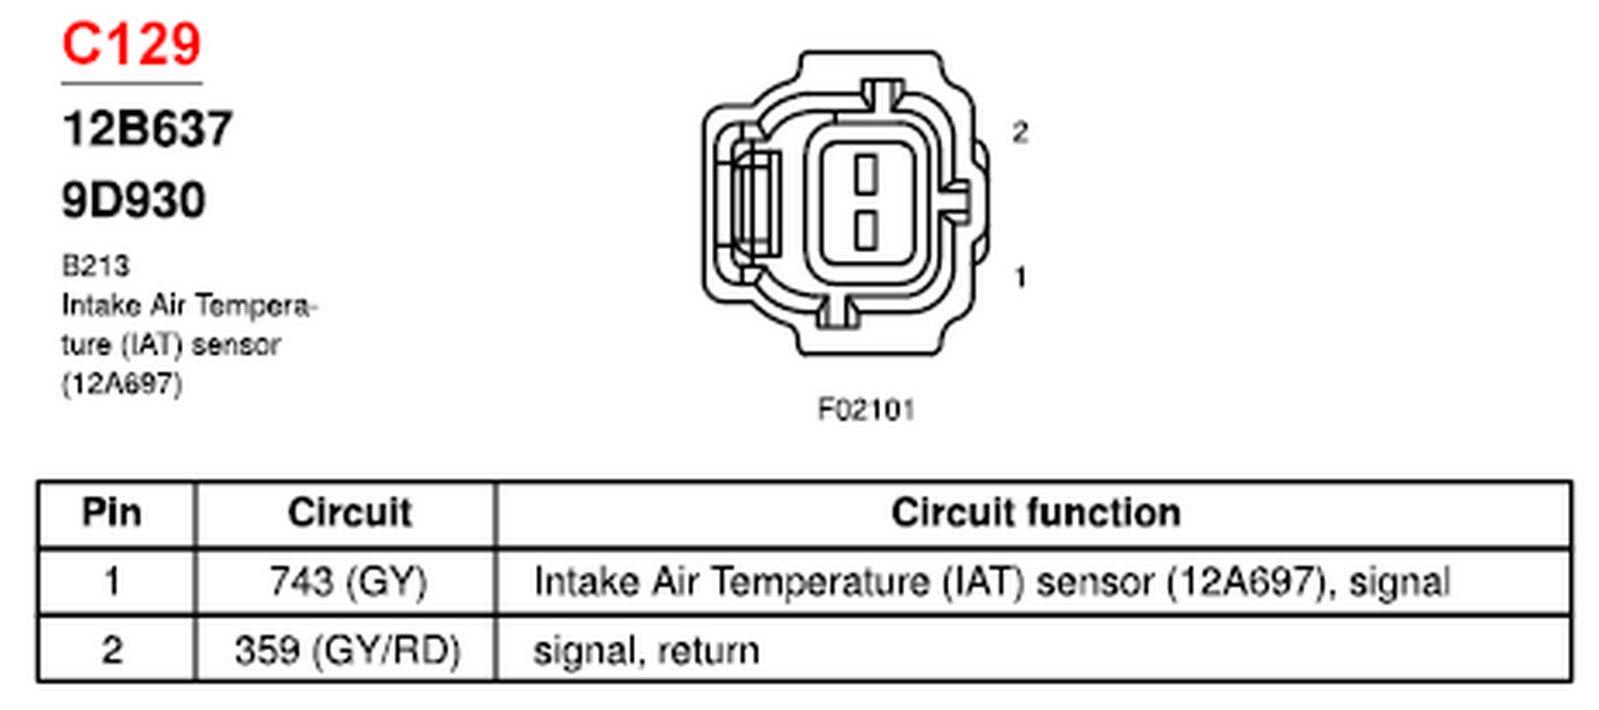 2010 03 16_215844_02_F 150_C129_IAT 2002 f 150 wiring diagram 5 4l 4x4 the maf so i 2002 f150 wiring diagram at mr168.co